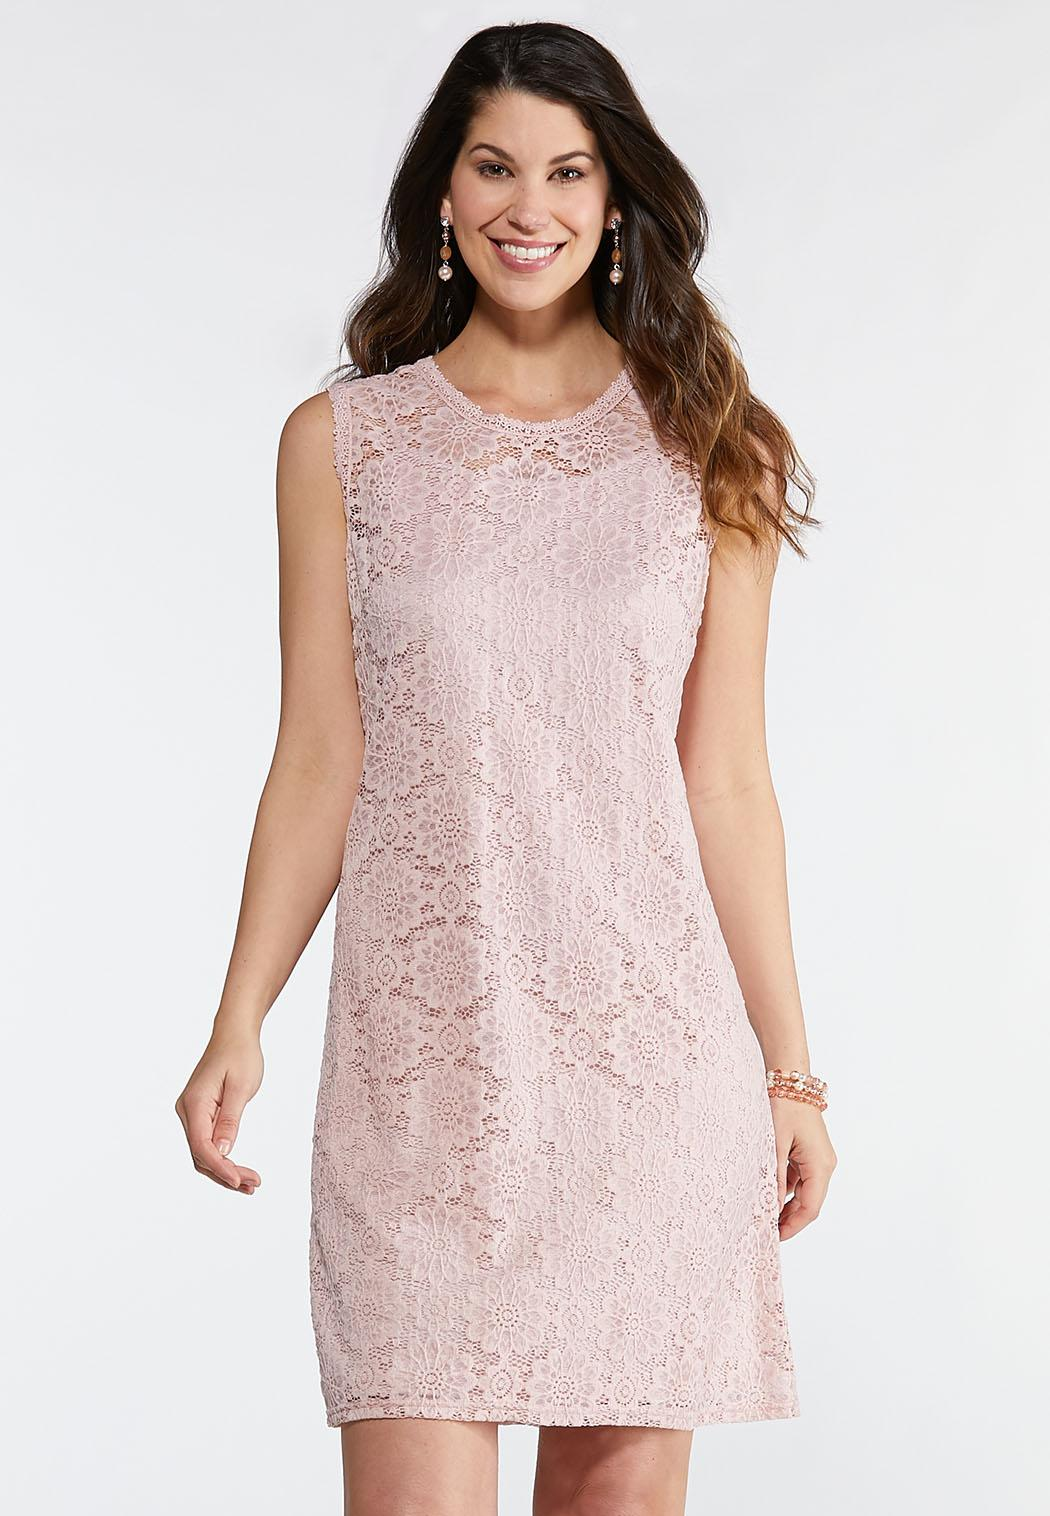 837461488 Pink Floral Lace Dress alternate view Pink Floral Lace Dress